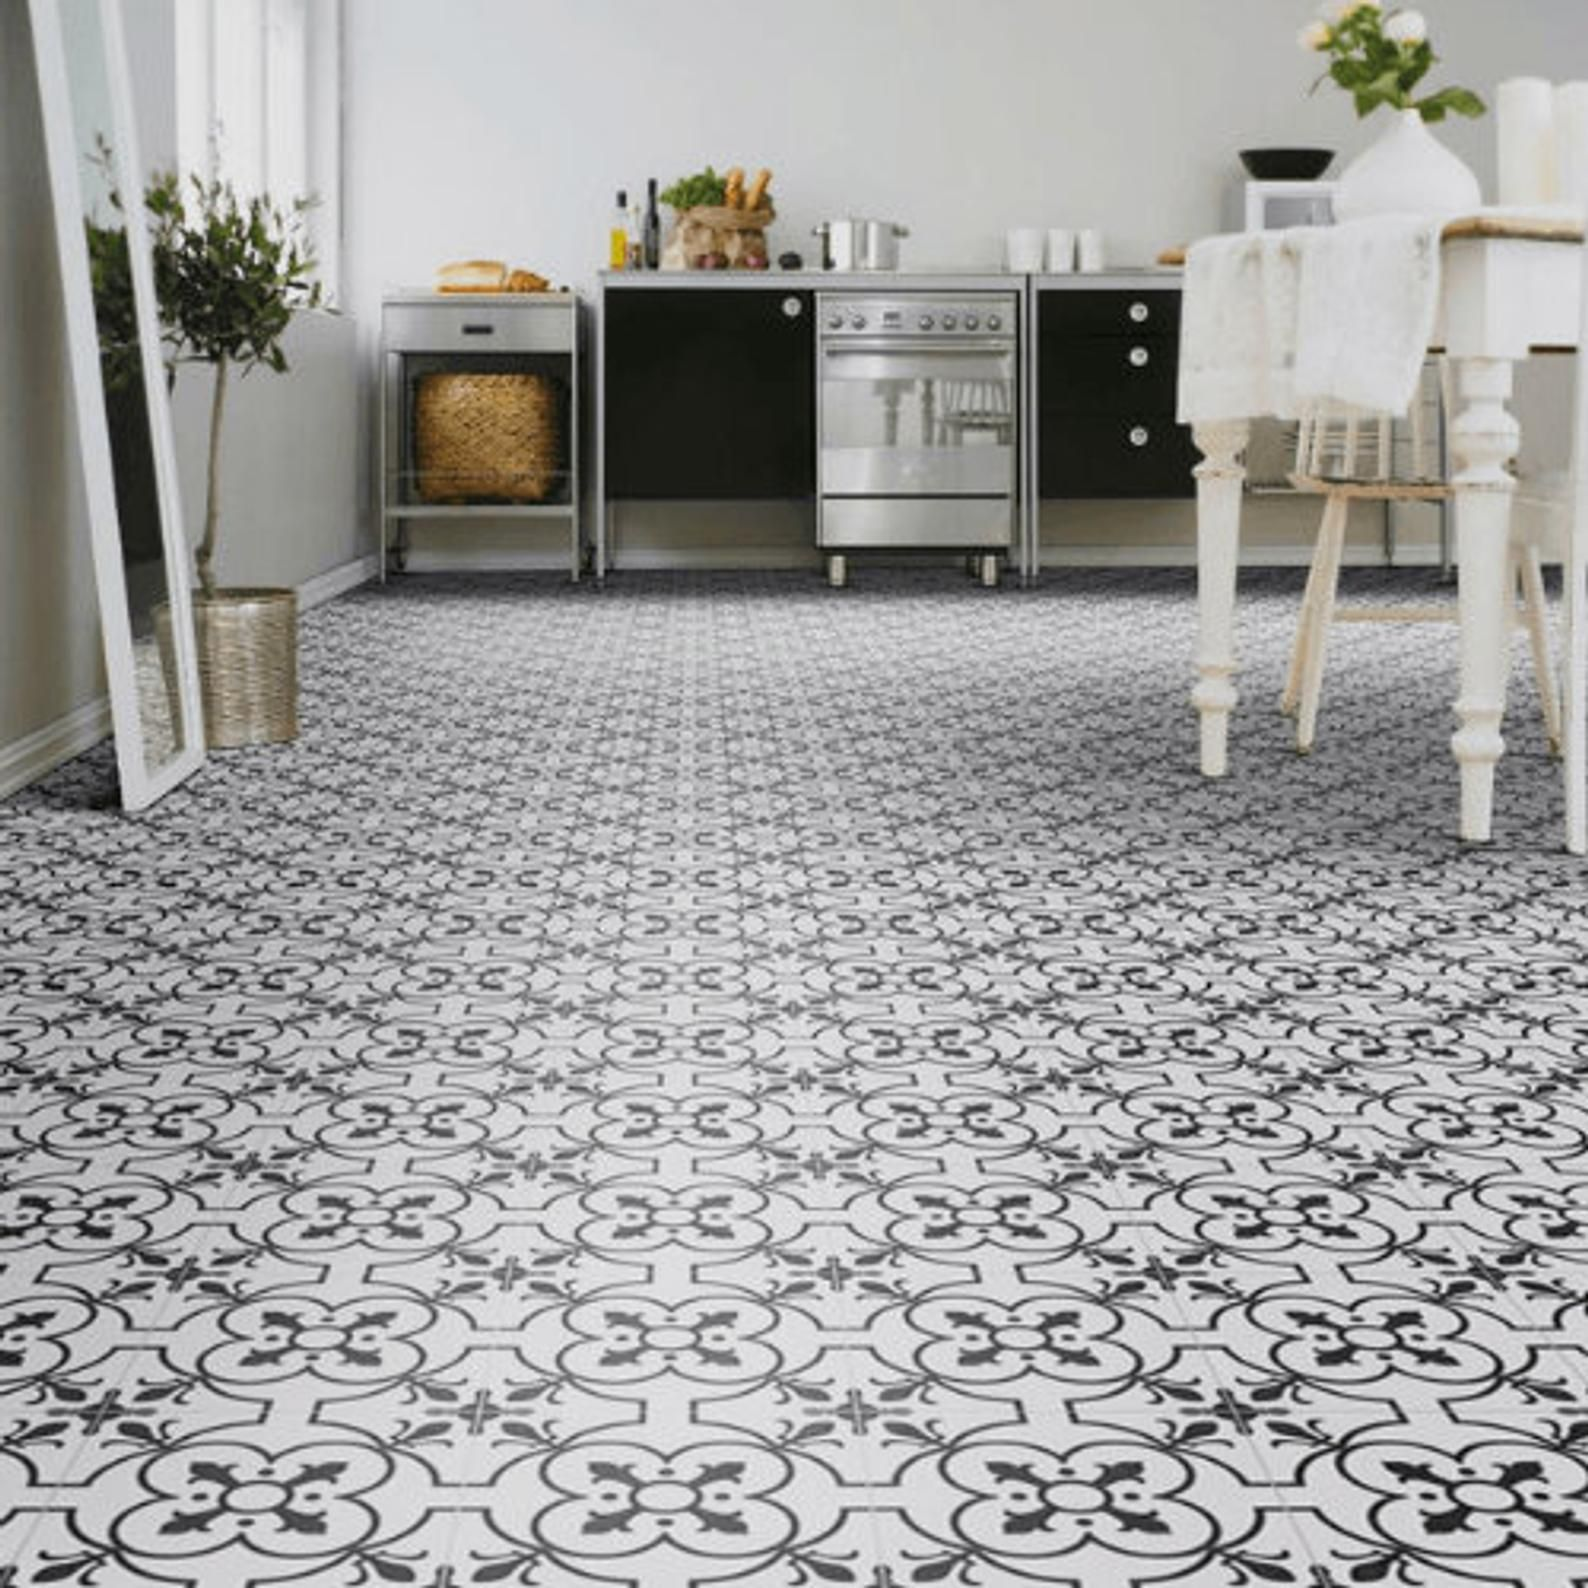 Ruskin White Sheet Vinyl Flooring 2 Metre Wide Roll Etsy In 2020 Vinyl Flooring Kitchen Vinyl Flooring Vinyl Flooring Bathroom